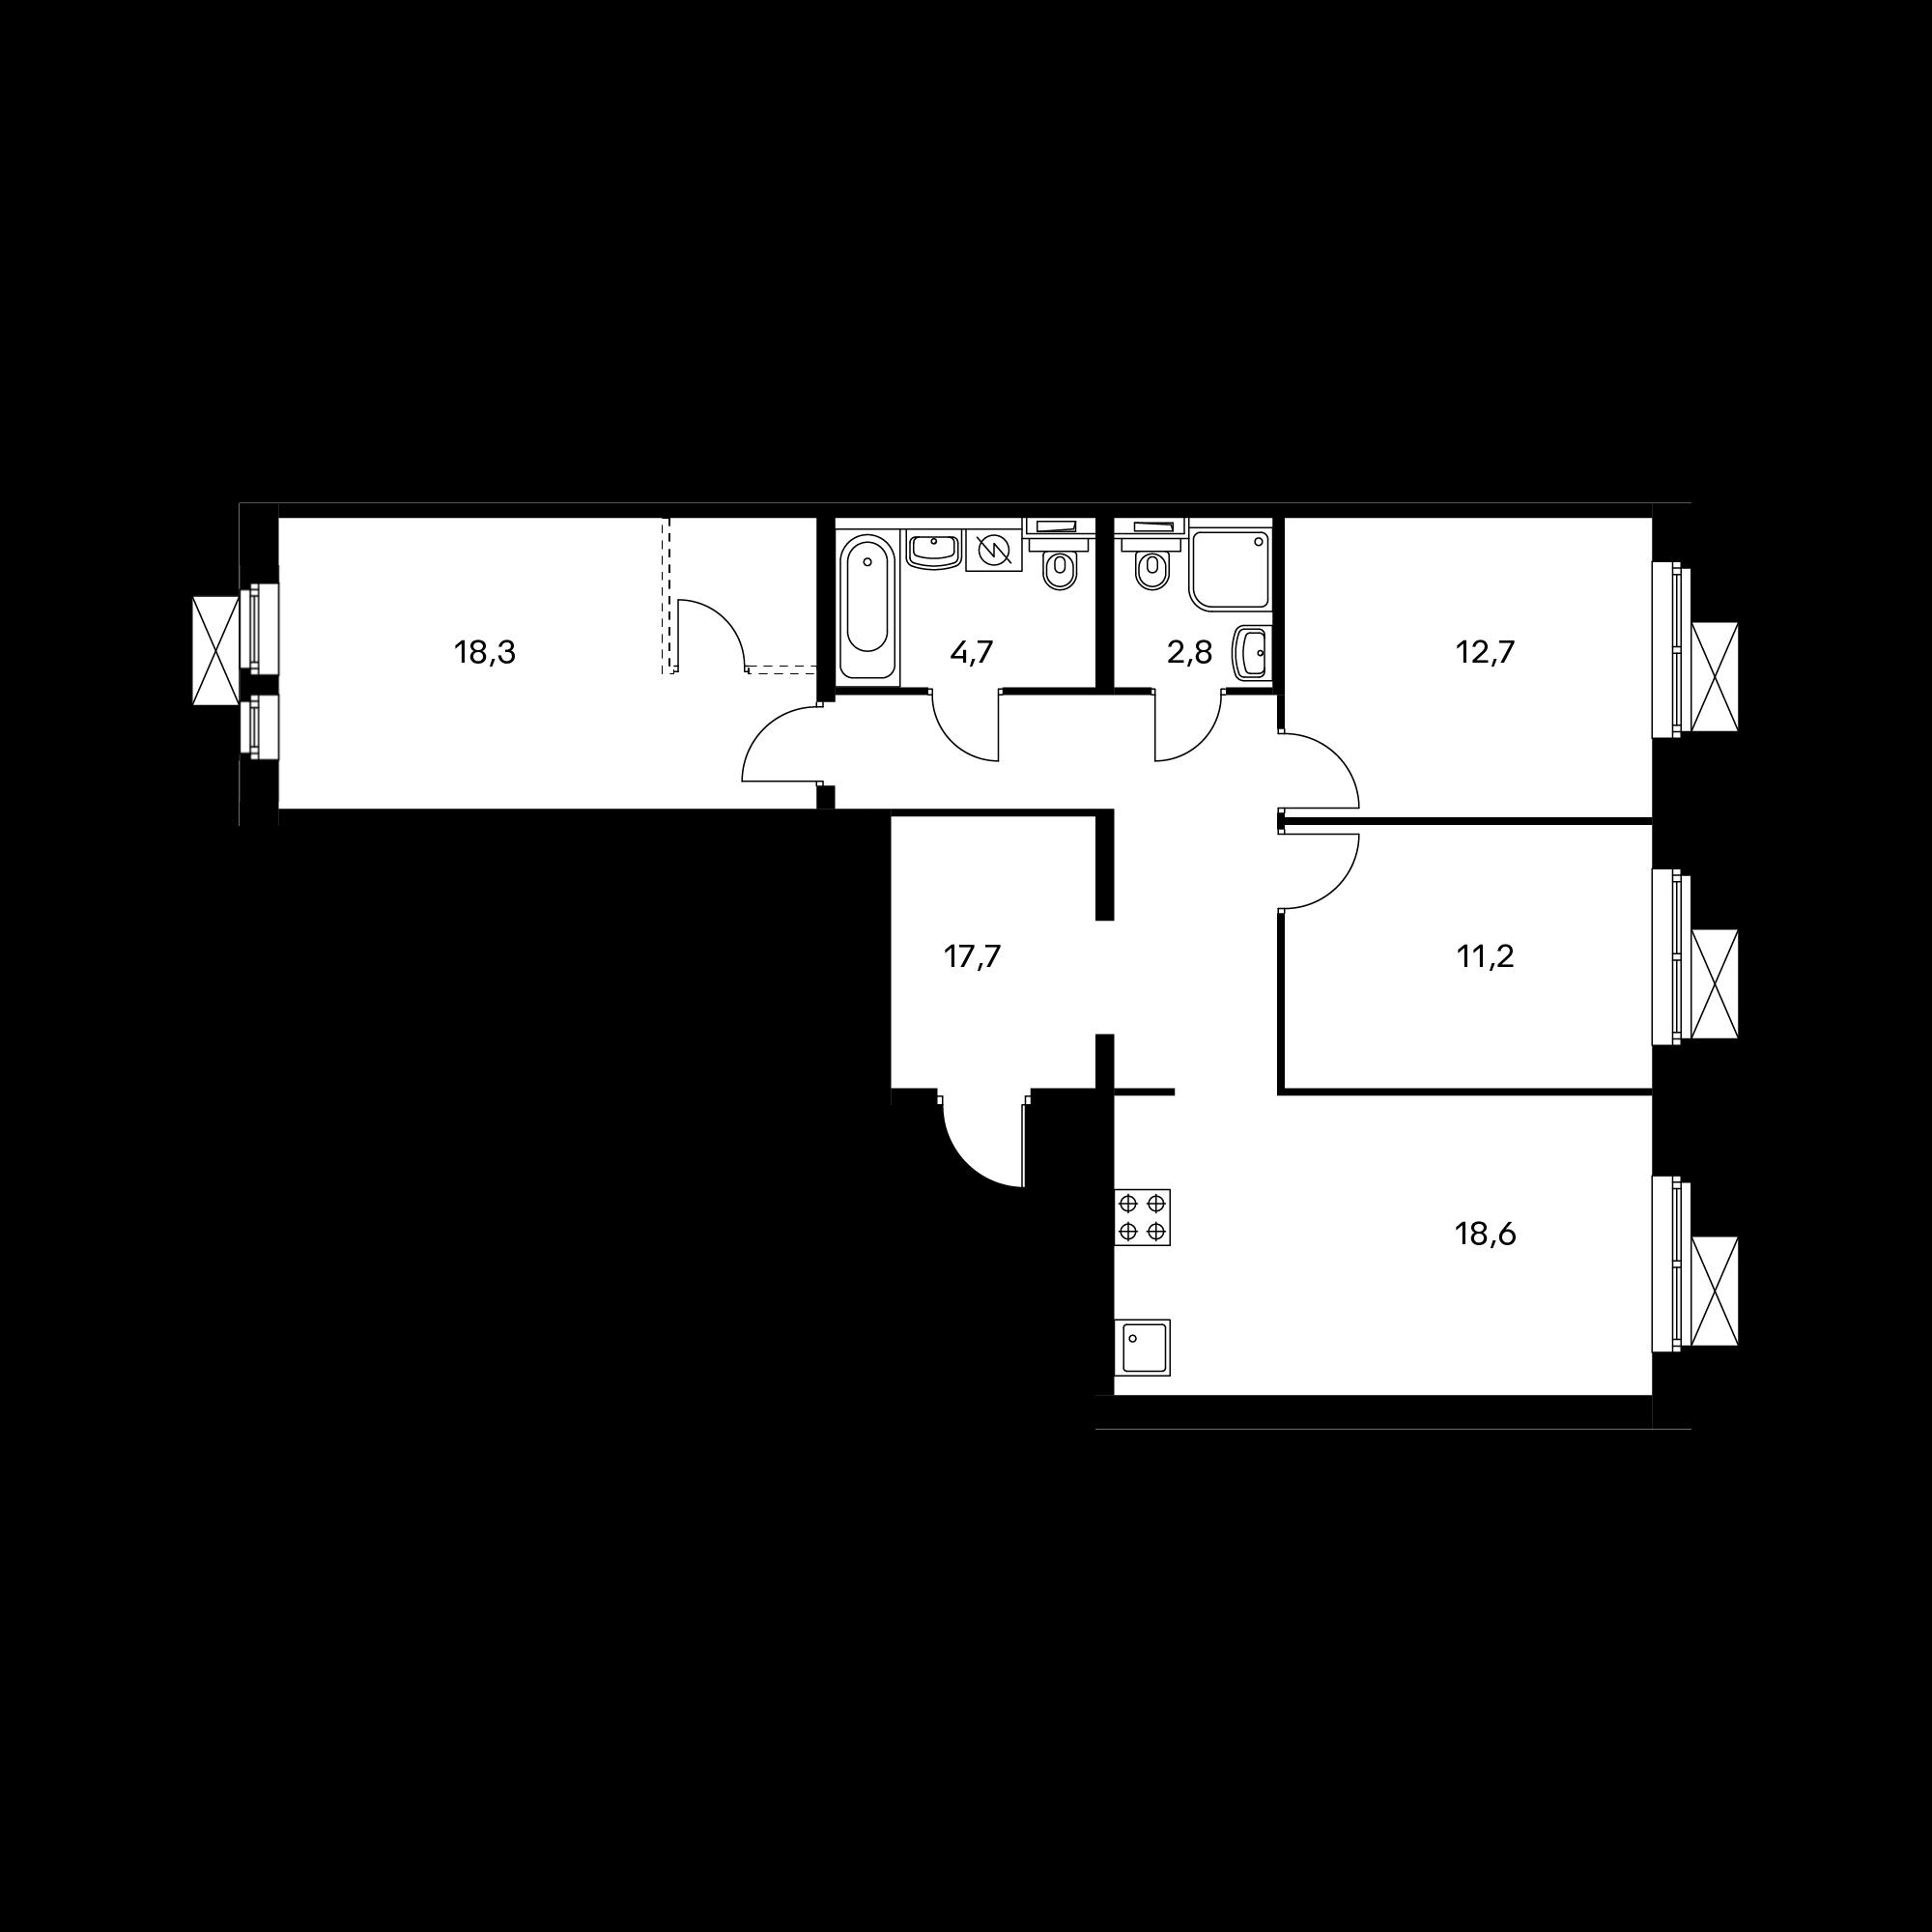 3EL3_9.6-4